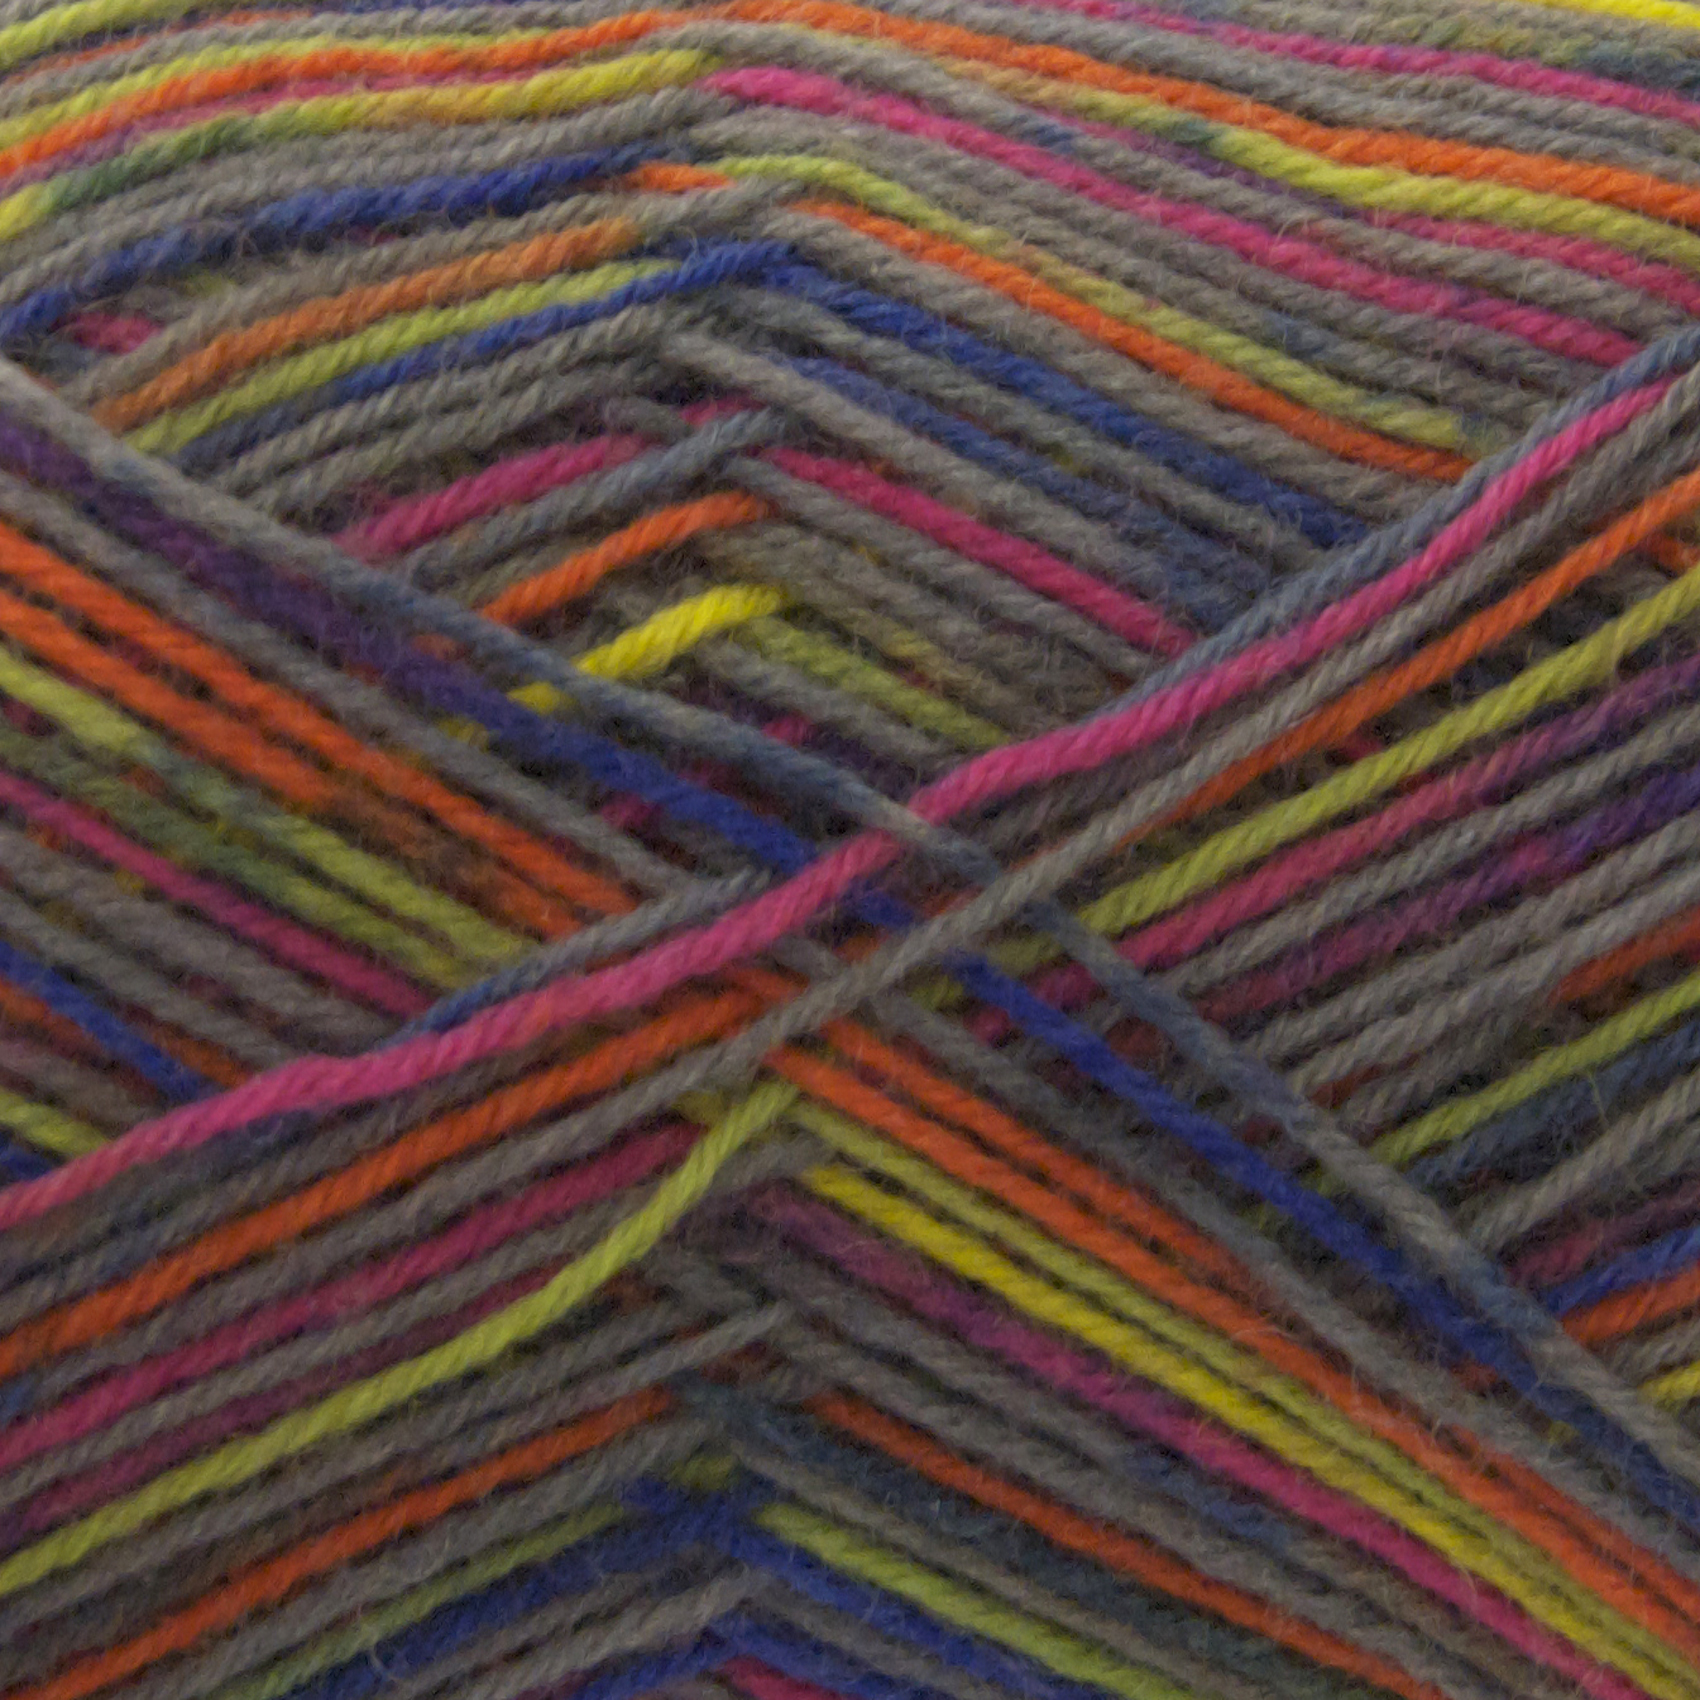 Knitting Patterns 4 Ply Wool : 100g Ball Zig Zag 4 Ply Sock Knitting Wool King Cole Superwash Soft Craft Yarn